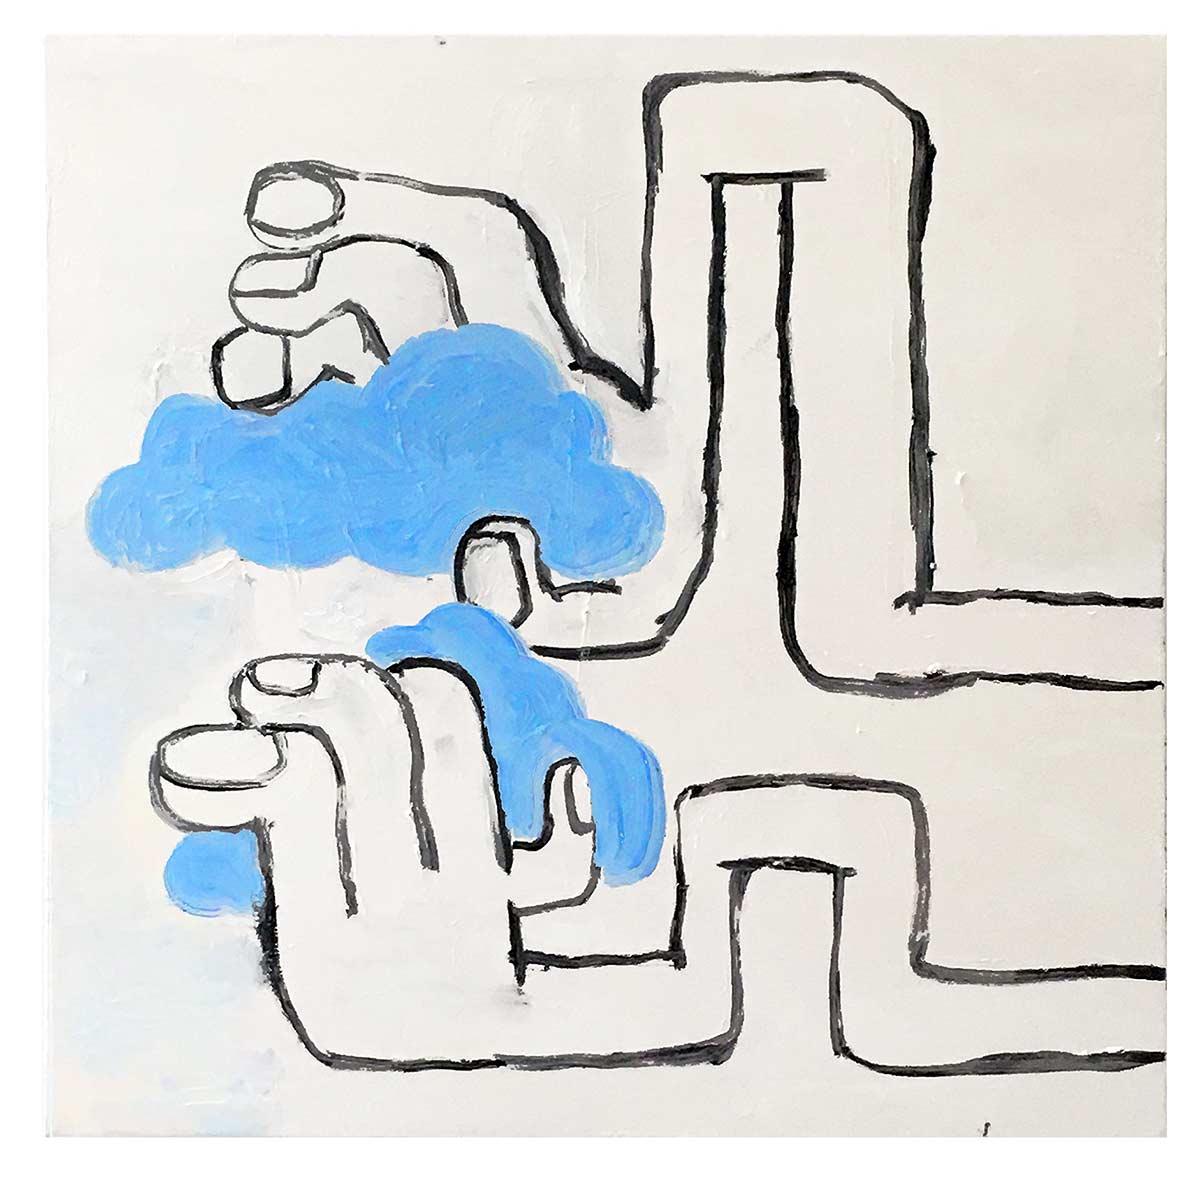 digital, contemporary painting, paint, zeitgenössische kunst, online,